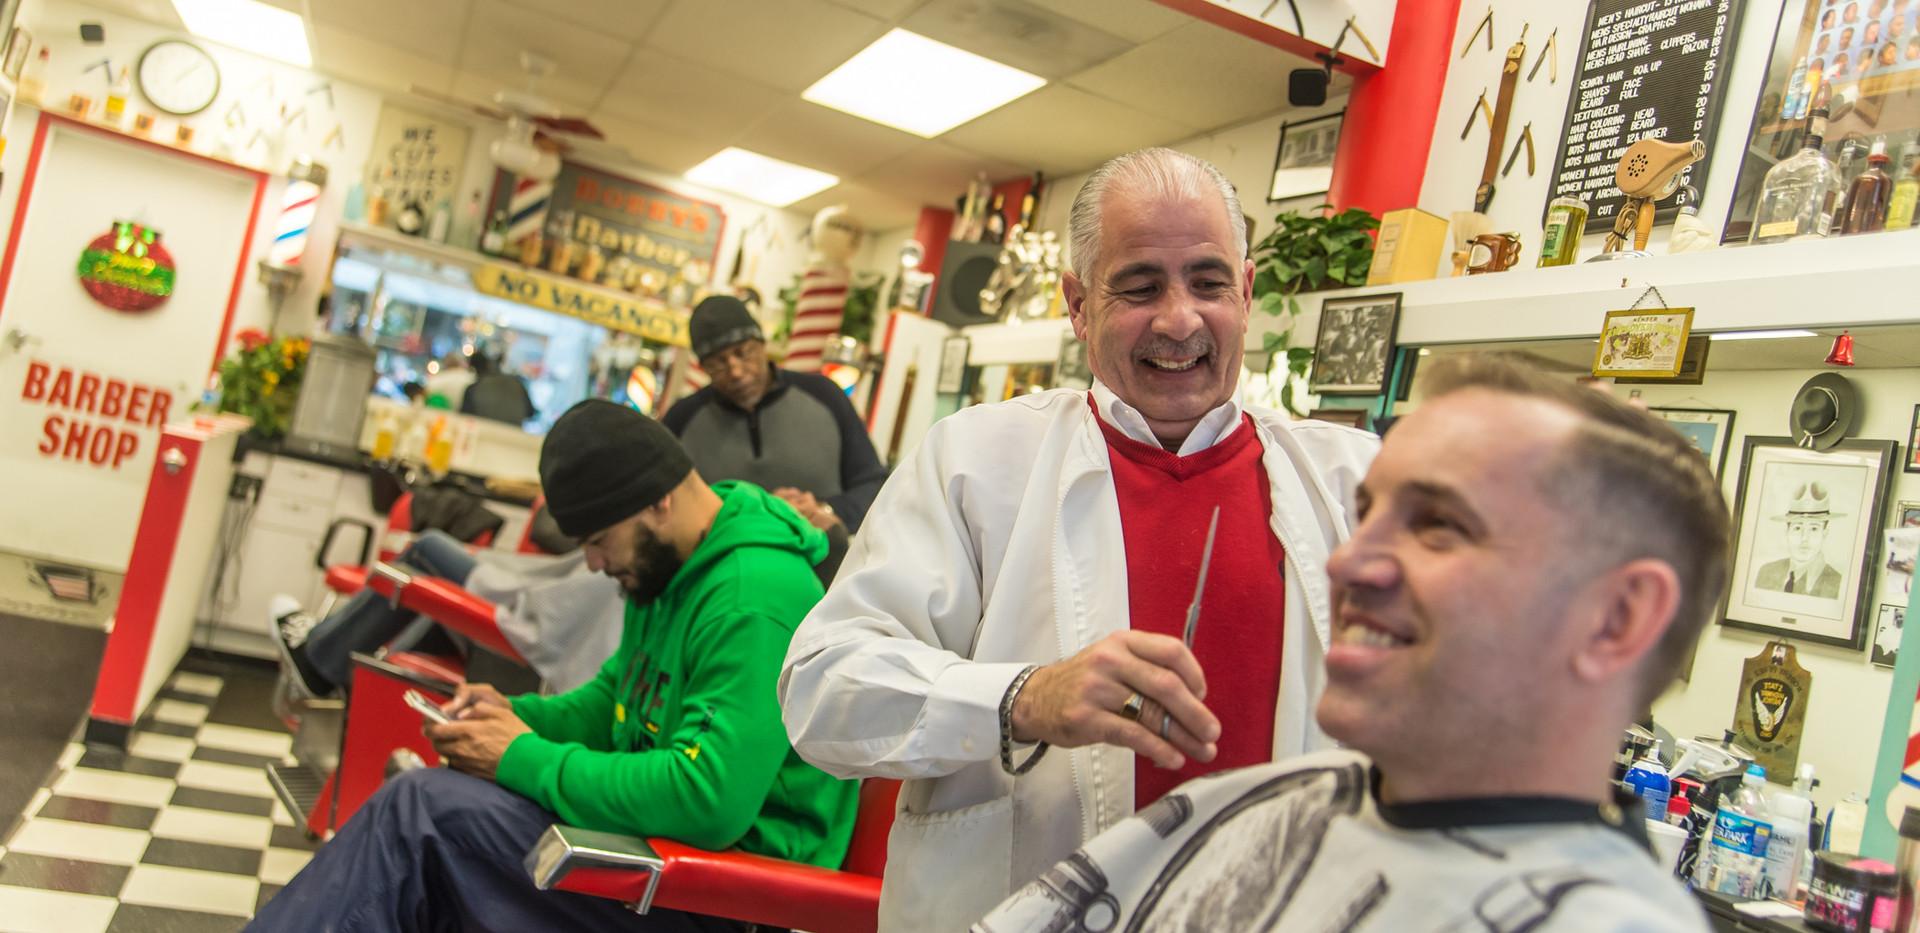 Bobby C's Classic Barbor Shop, 5th Street Arcades, Cleveland